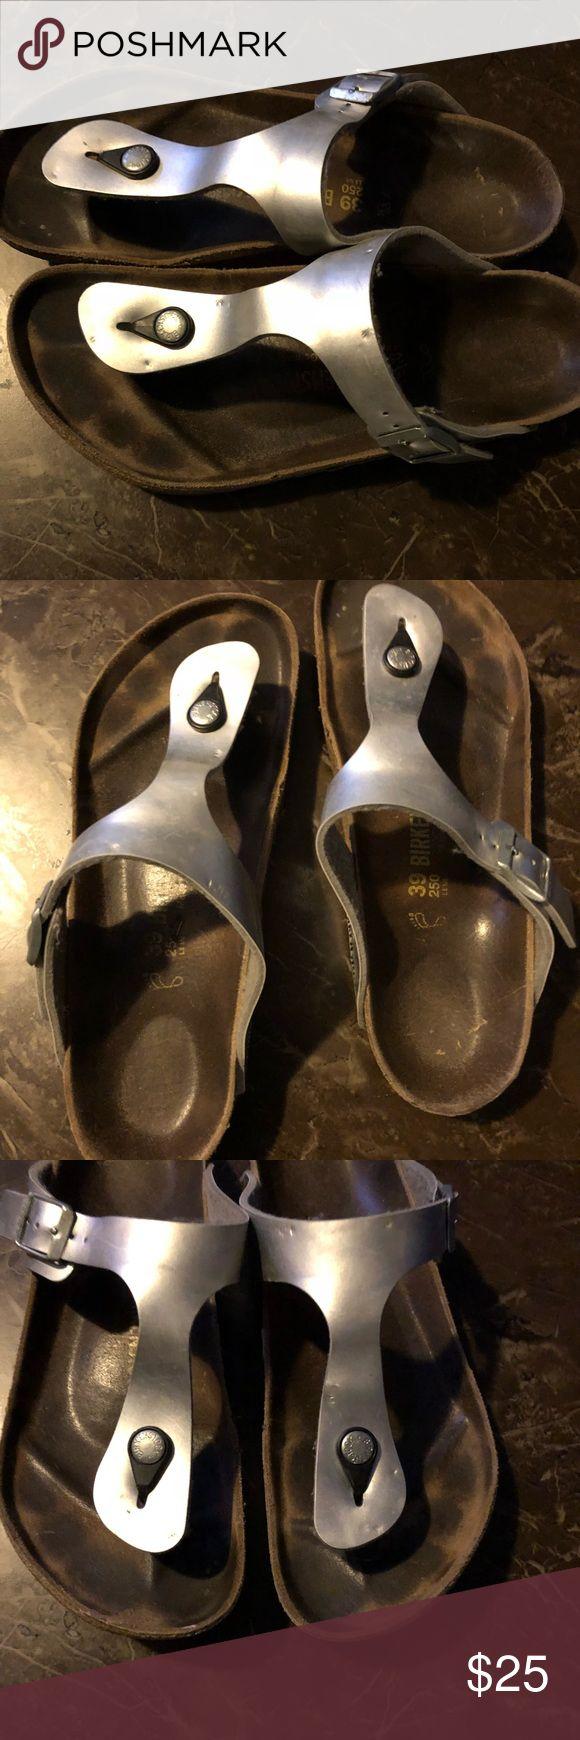 Birkenstock Gizeh Silver Sandals - Size 39. Birkenstock Gizeh Sandal. Size: 39. Birkenstock Shoes Sandals